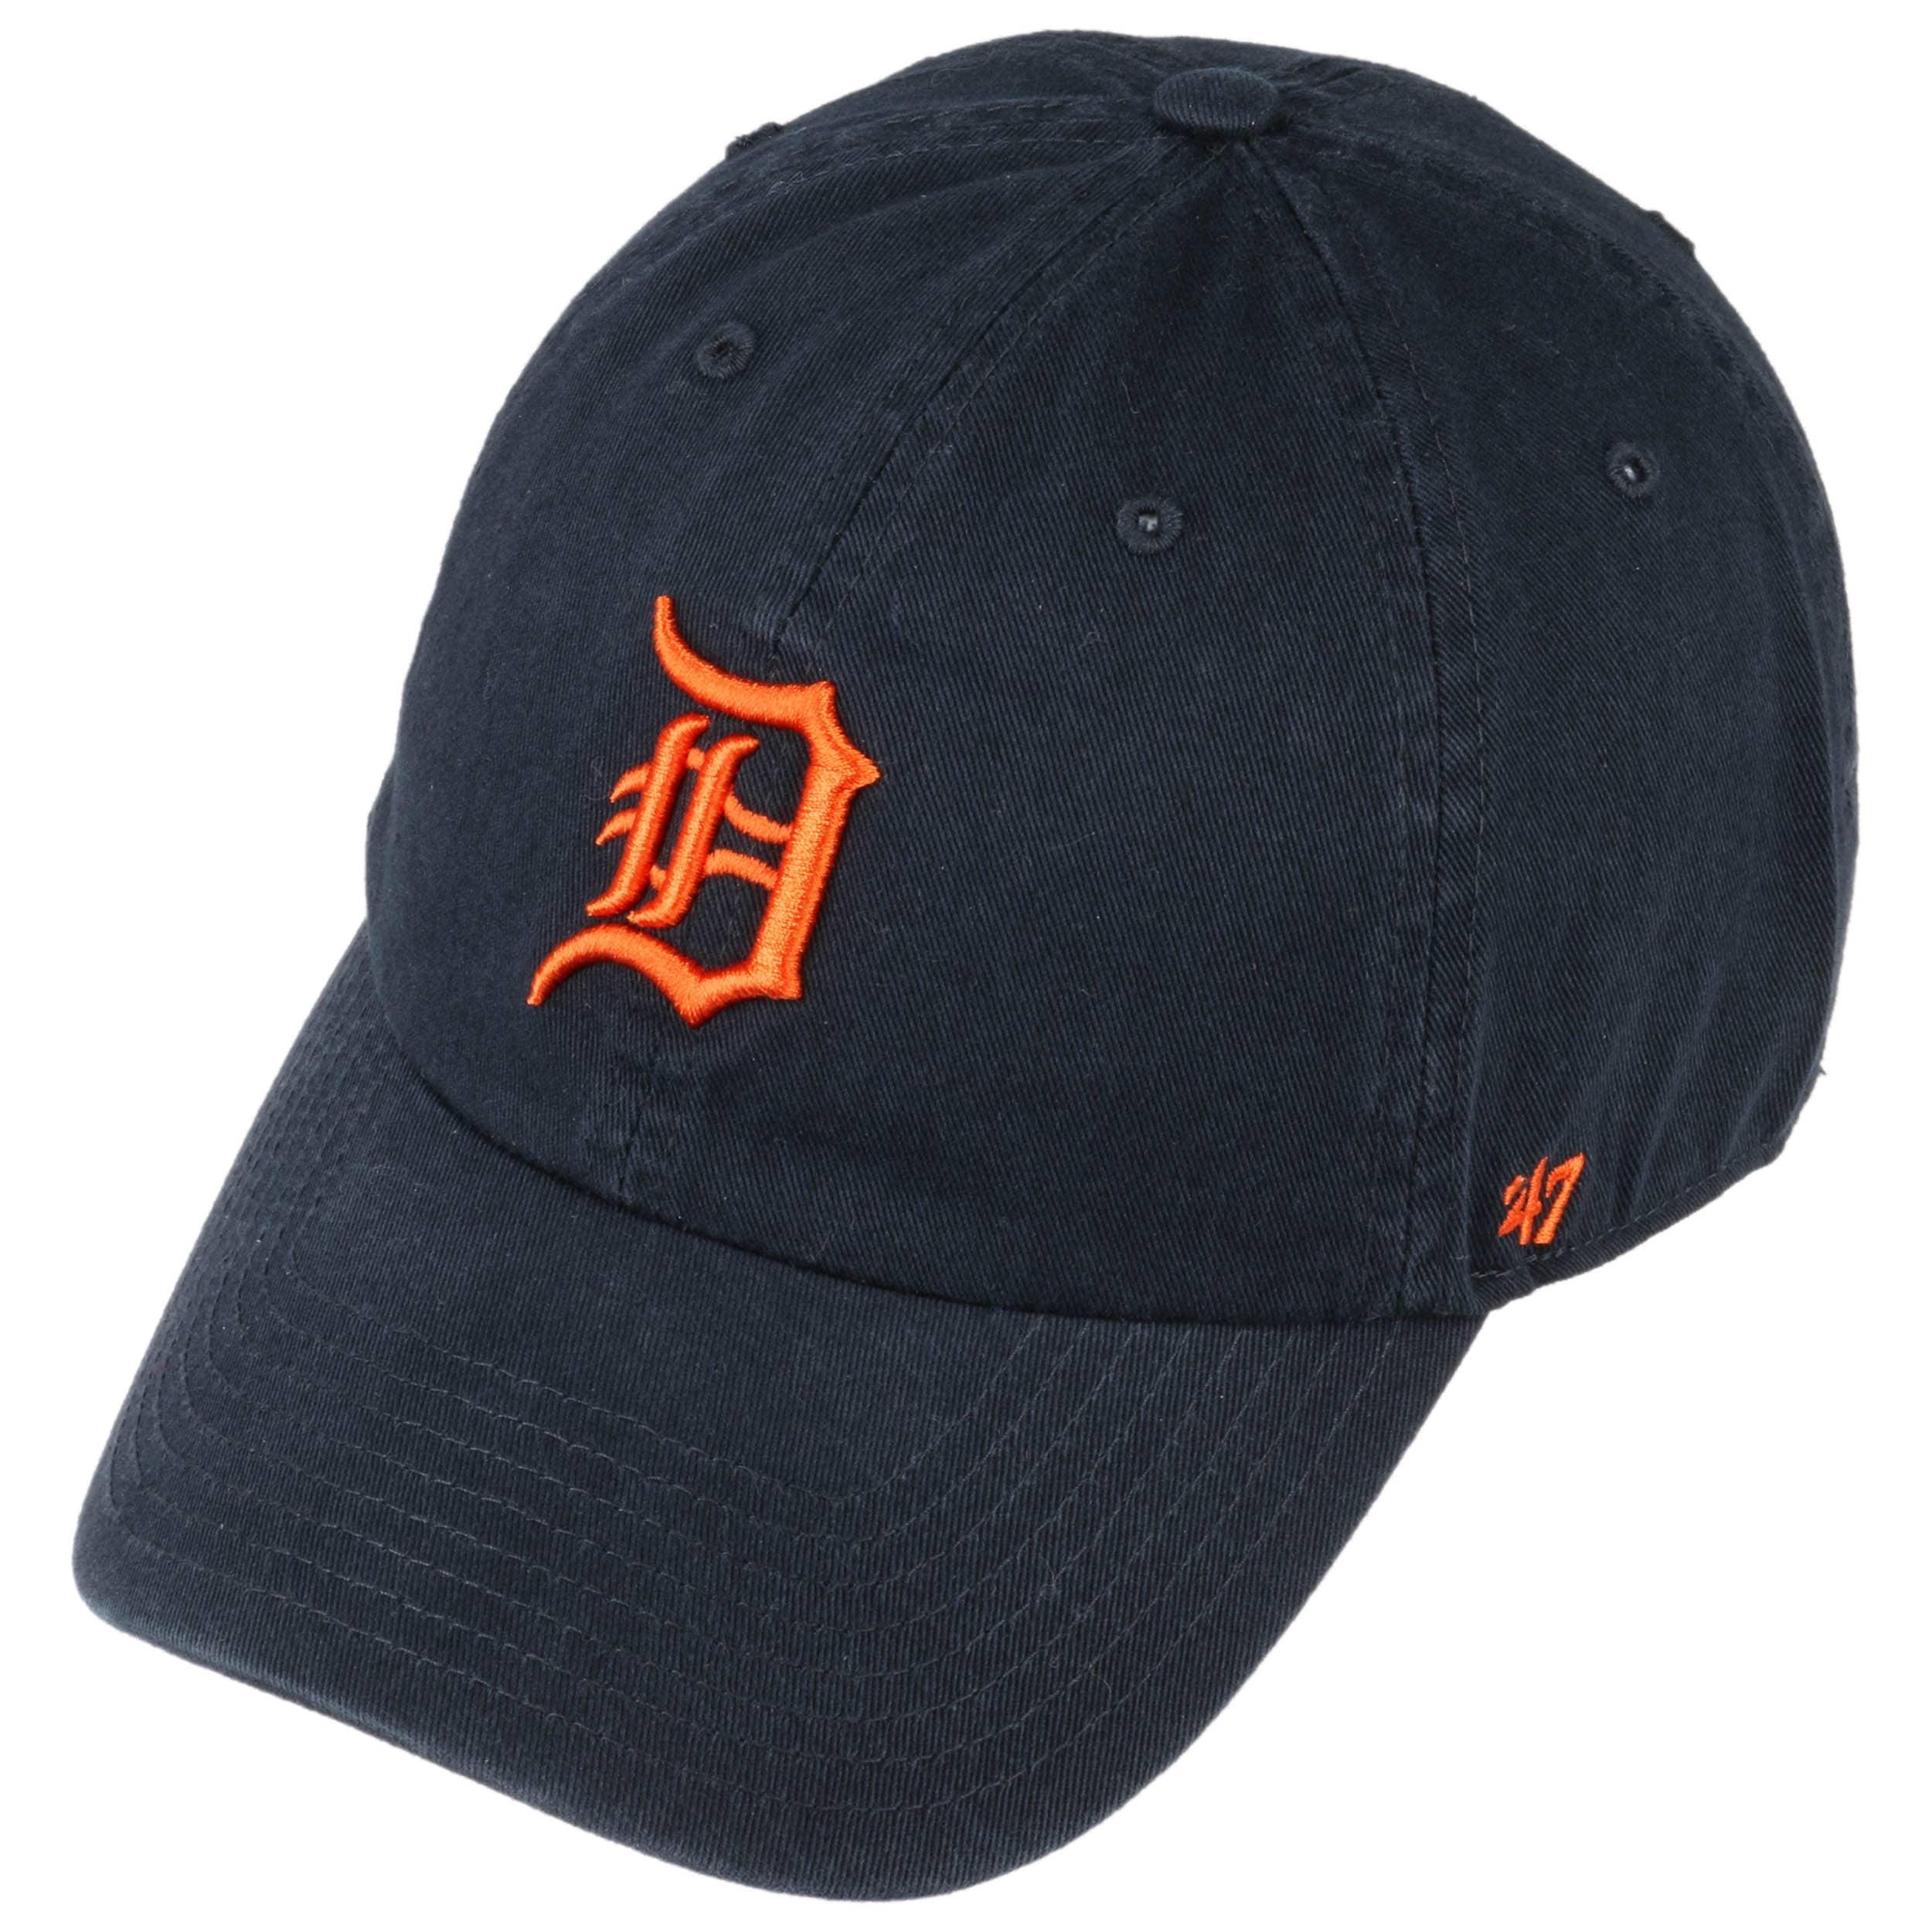 Gorra Clean Up Detroit Tigers by 47 Brand - Gorras - sombreroshop.es e58a62d903d